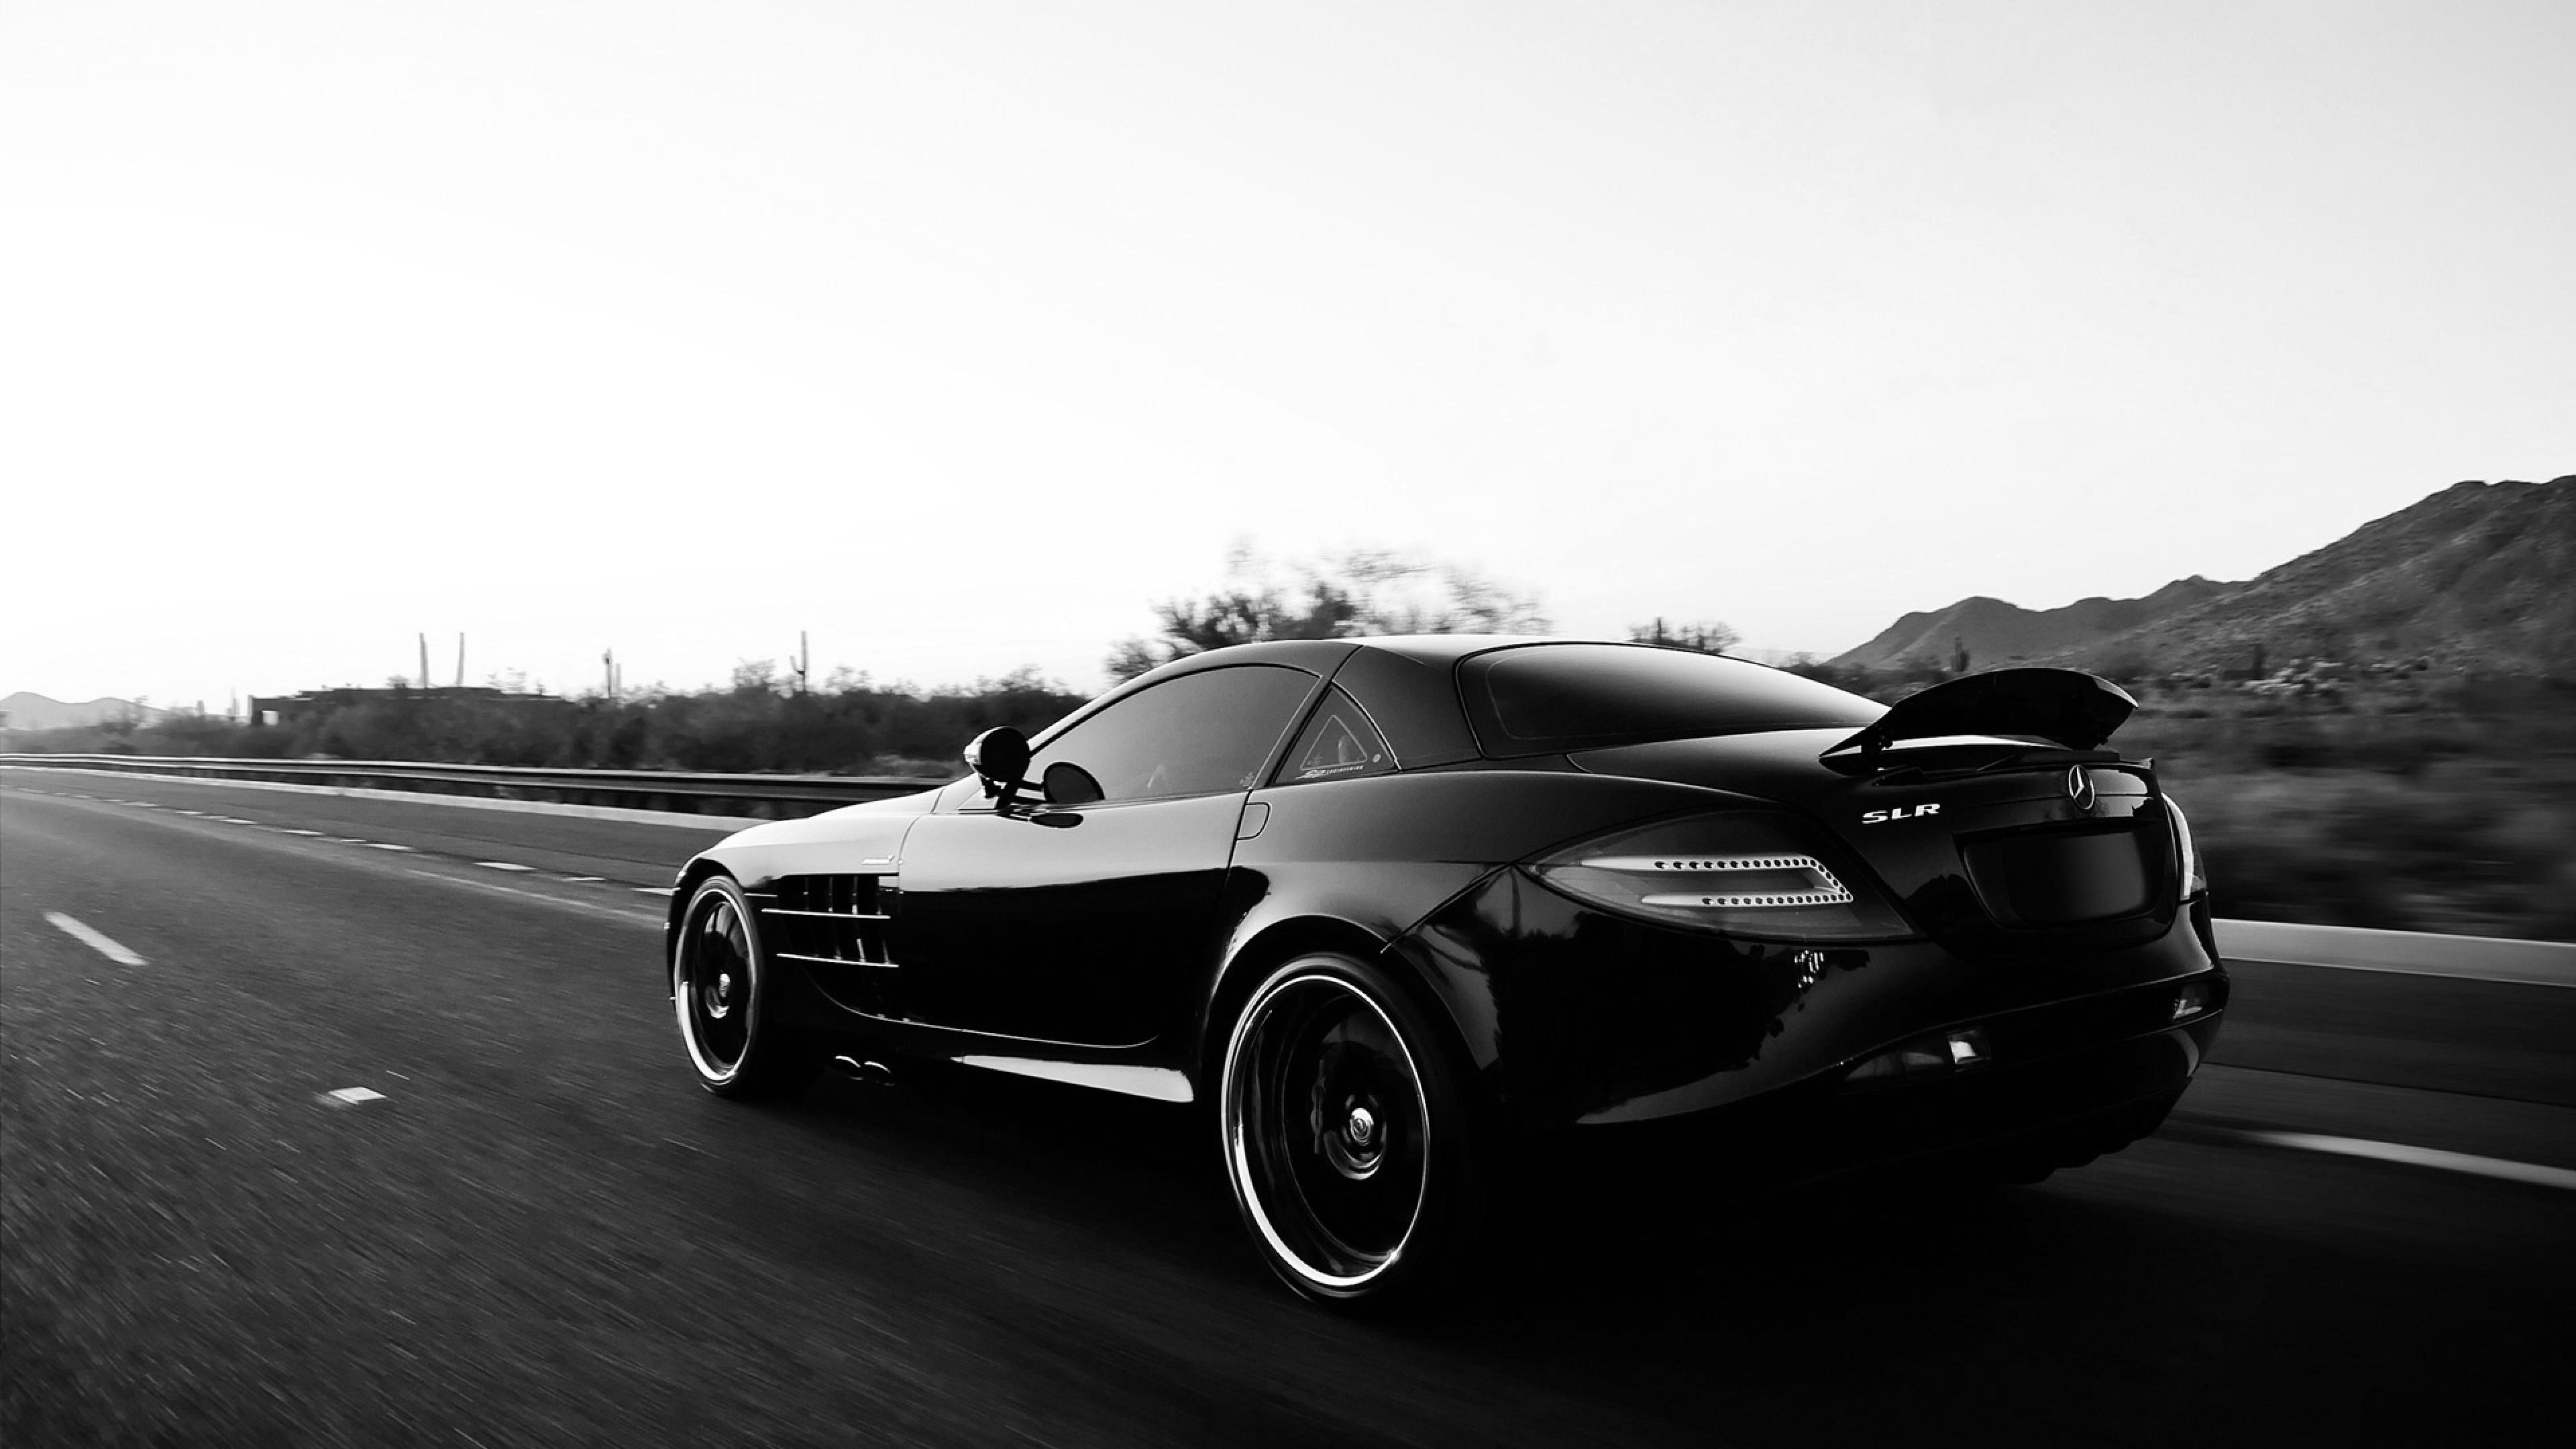 Lamborghini Wallpapers Wallpaper Black Cars Wallpaper 4k 3840x2160 Wallpaper Teahub Io